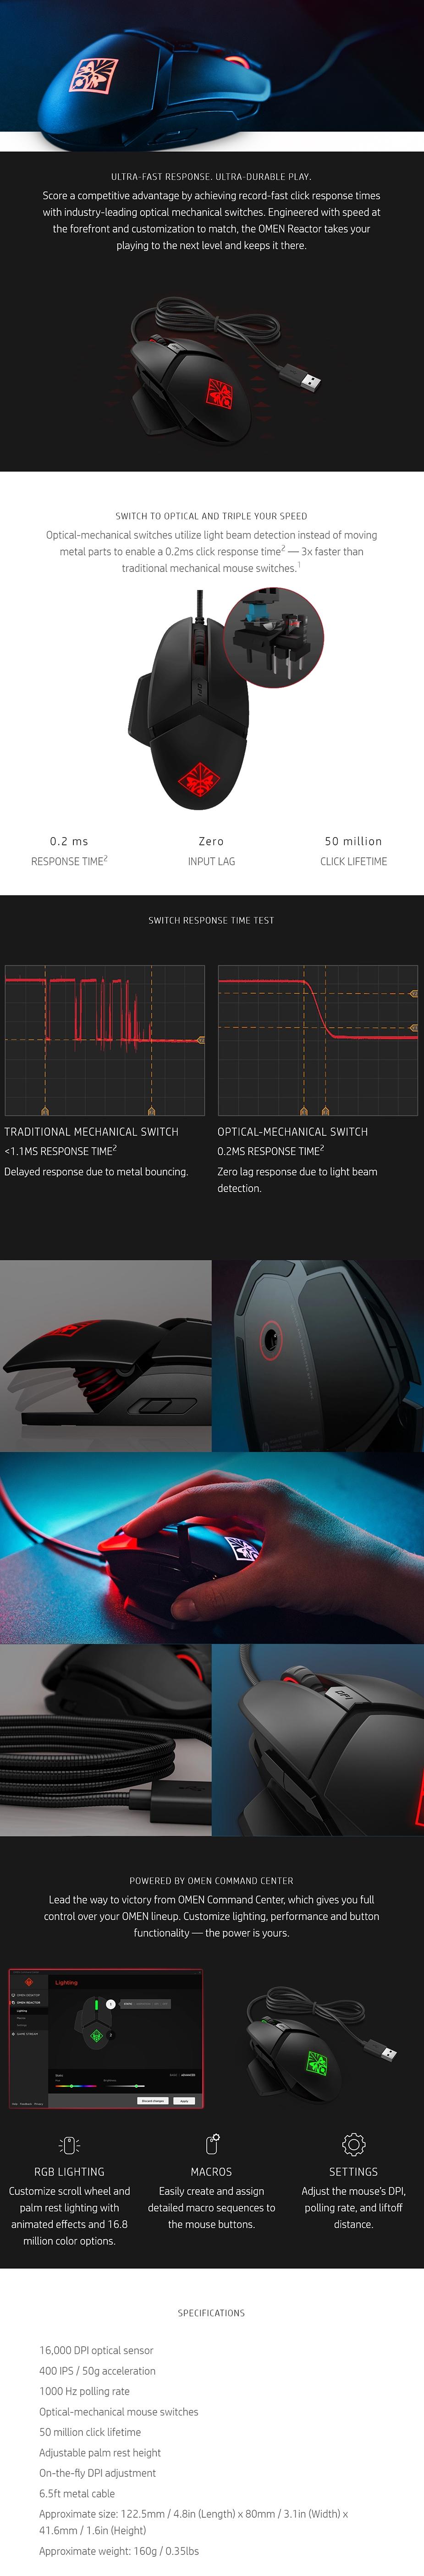 HP OMEN Reactor Optical Gaming Mouse - 2VP02AA   Mwave com au